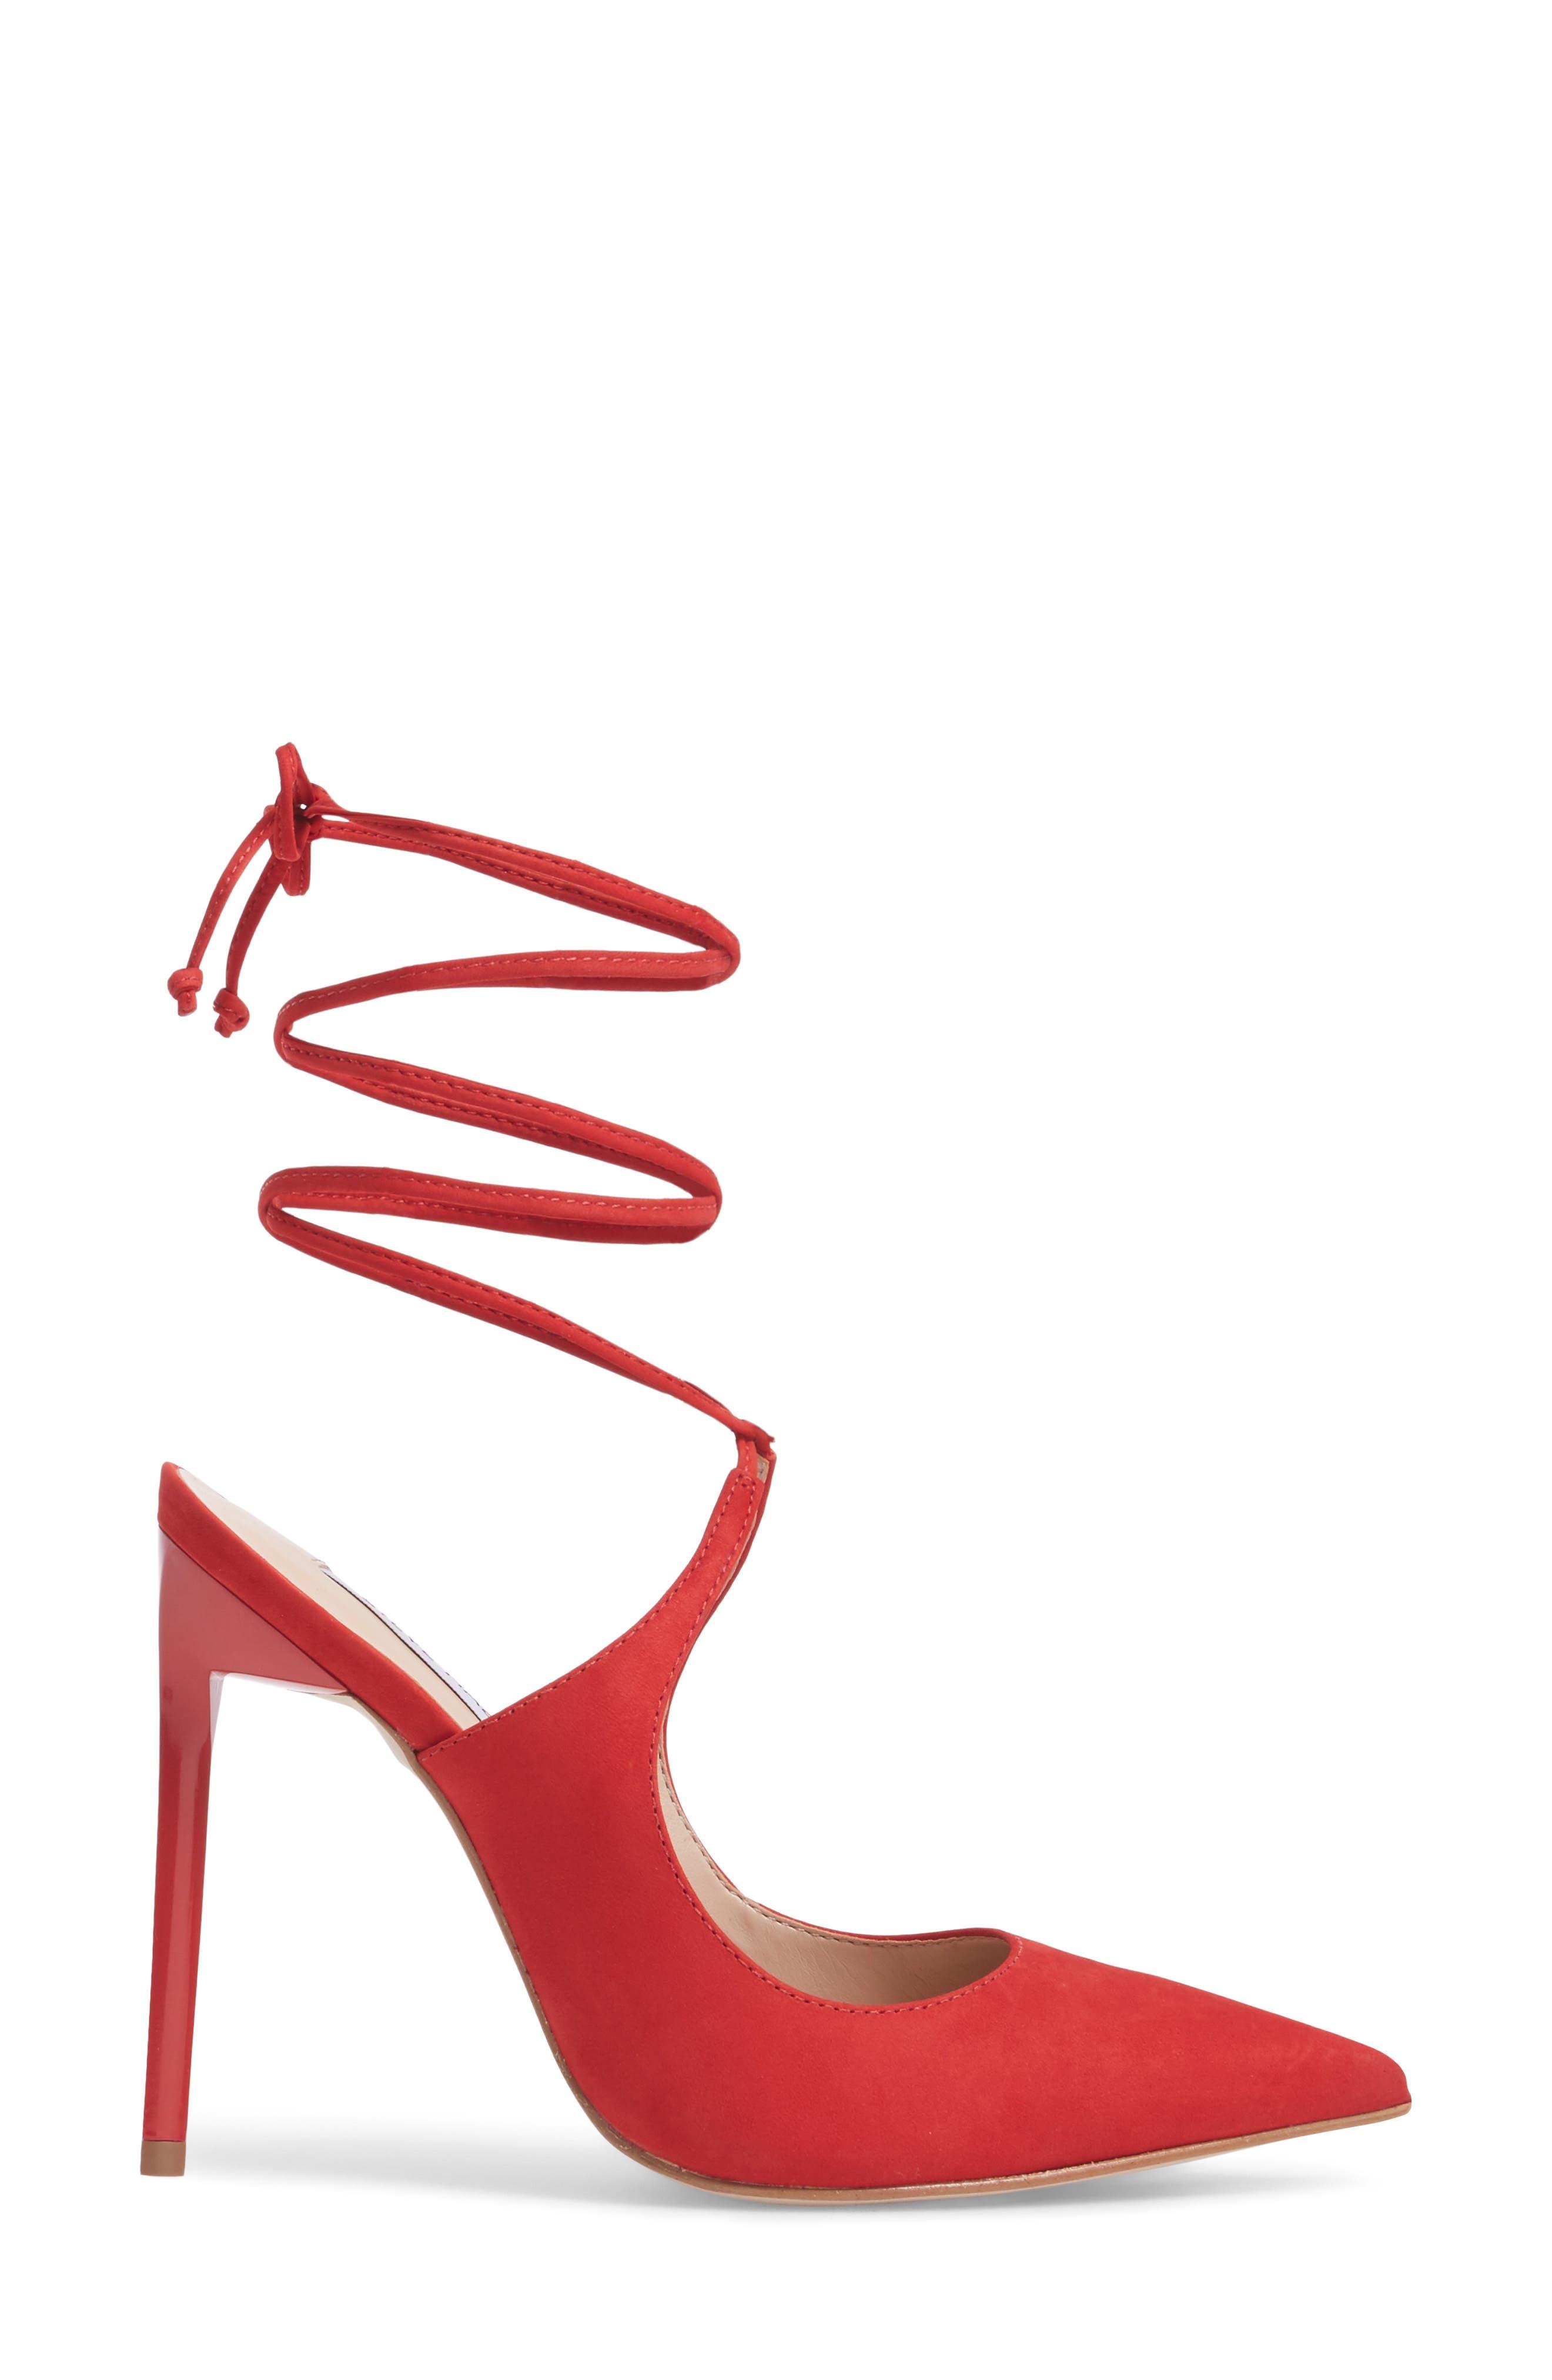 Raven Ankle Wrap Pump,                             Alternate thumbnail 3, color,                             Red Nubuck Leather